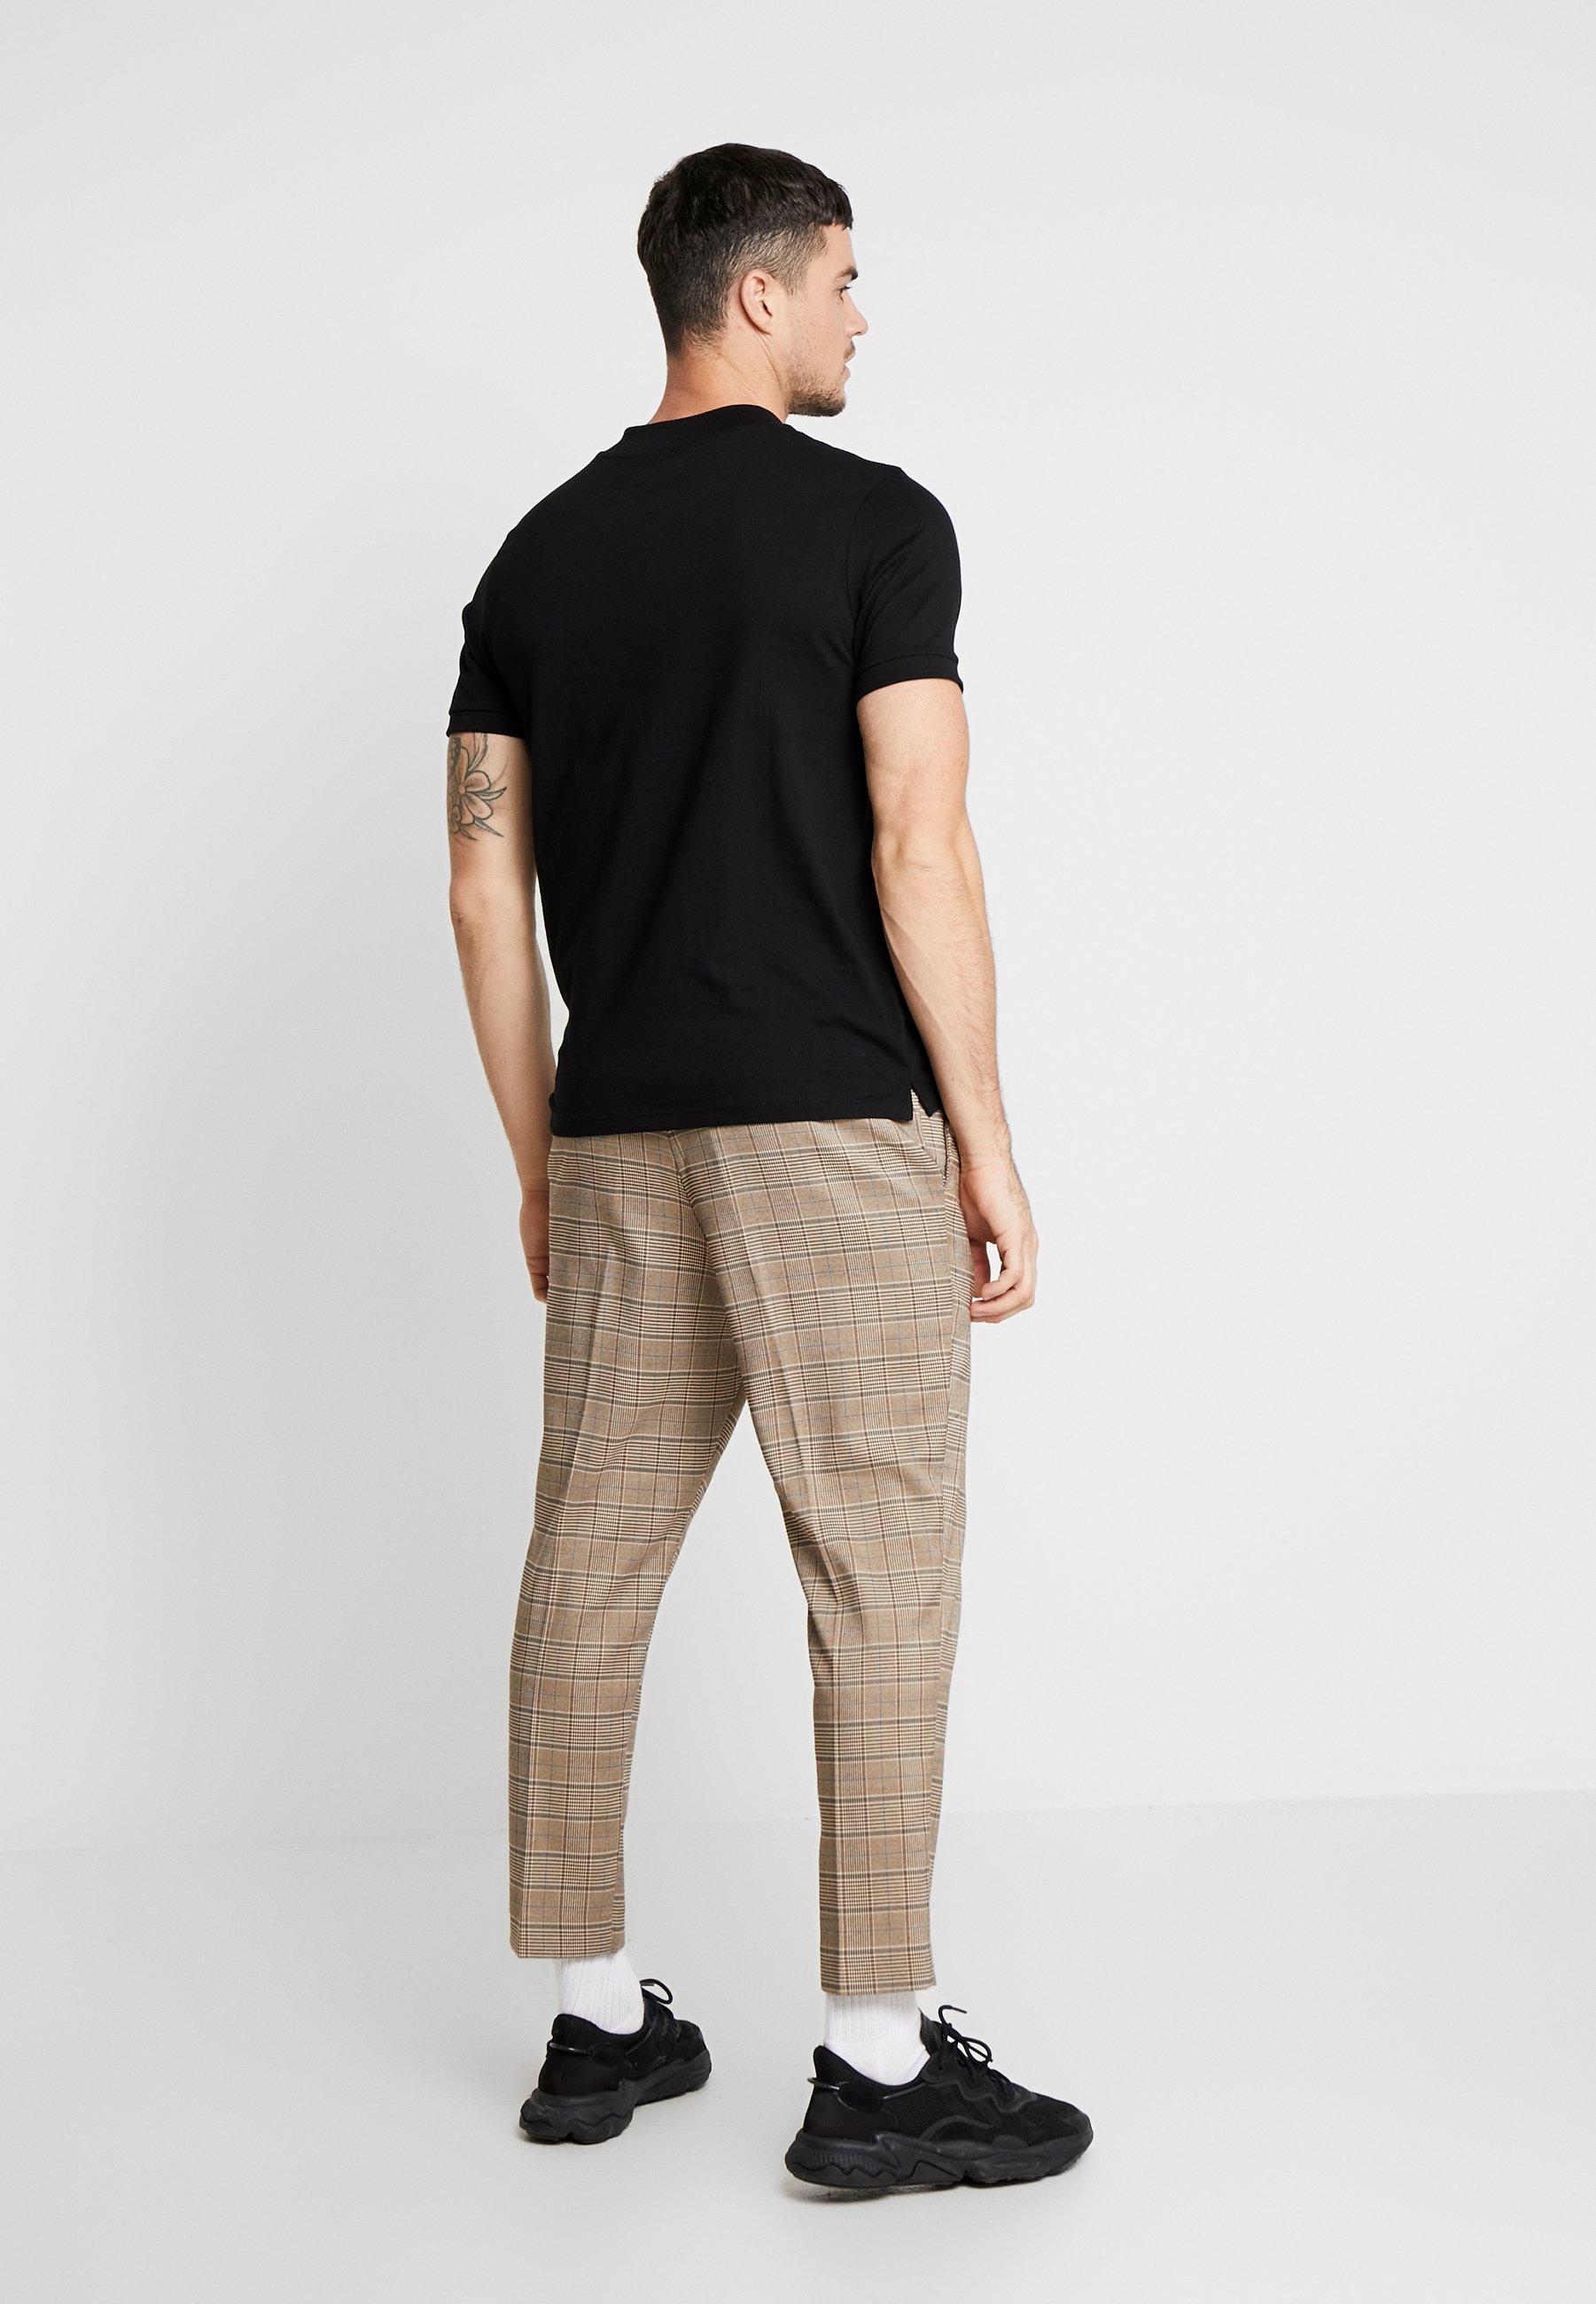 TurtleT Black Basic shirt Topman Topman TurtleT shirt 0wP8nkXO